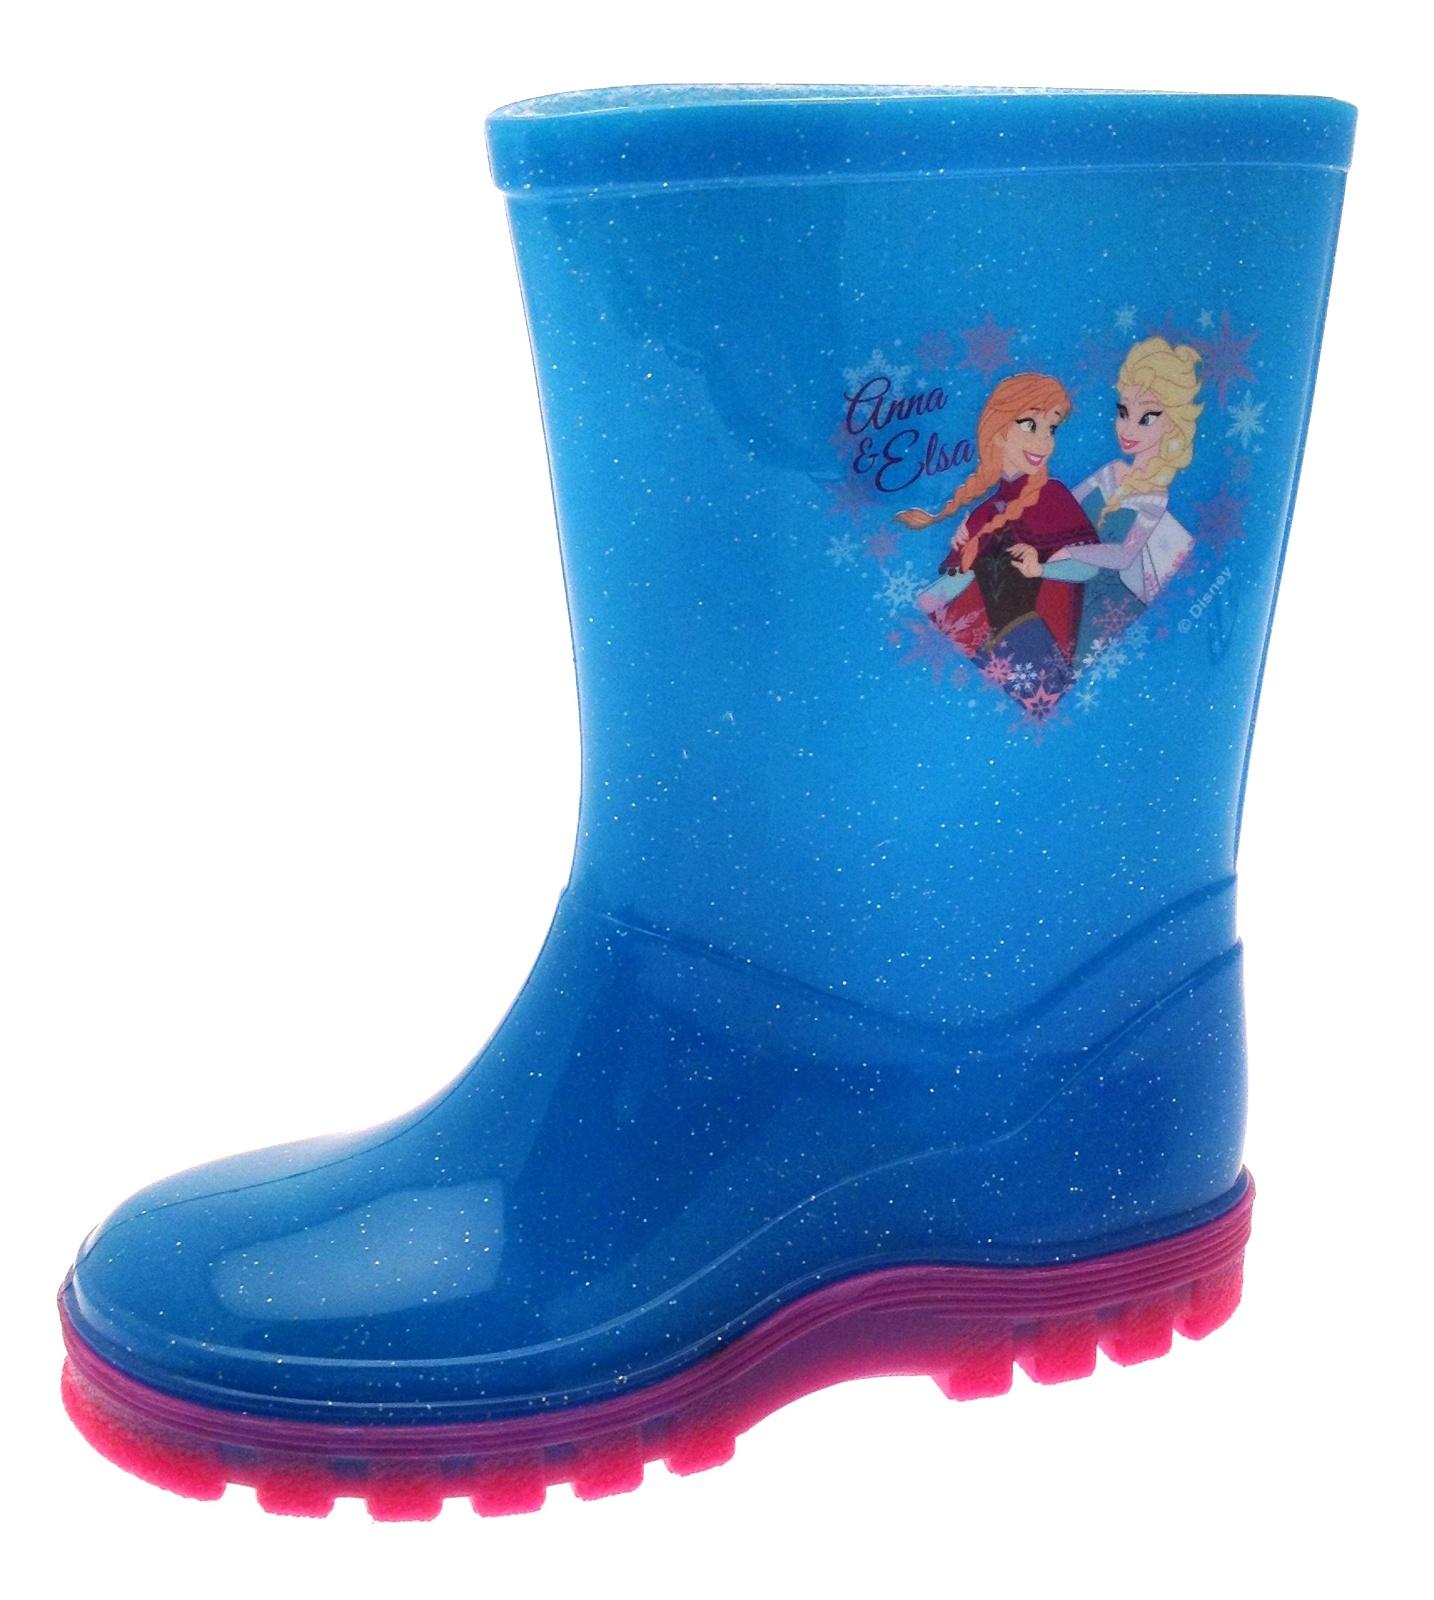 GIRLS PINK GLITTER UNICORN WELLIES WELLINGTON RAIN SNOW BOOTS INFANTS SIZE 6-12